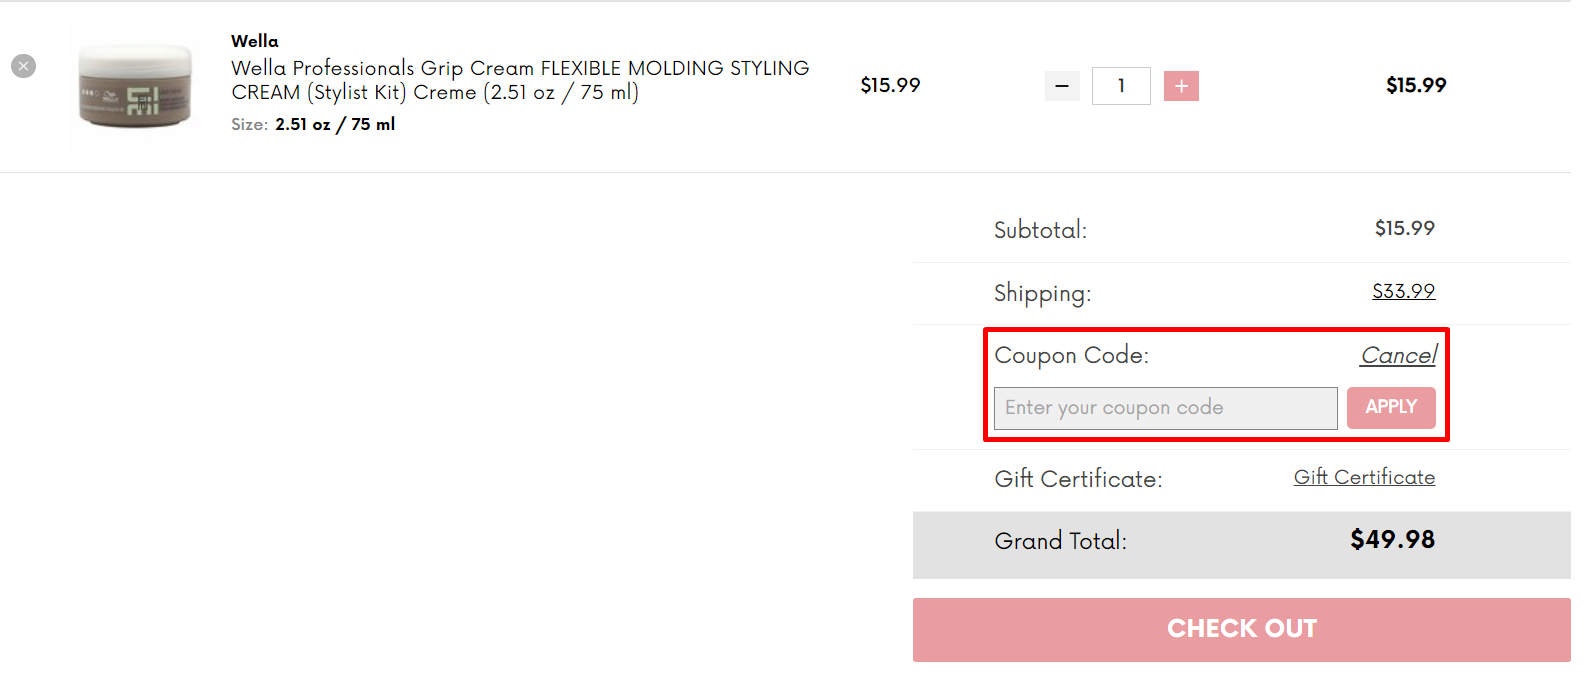 How do I use my SleekShop coupon code?